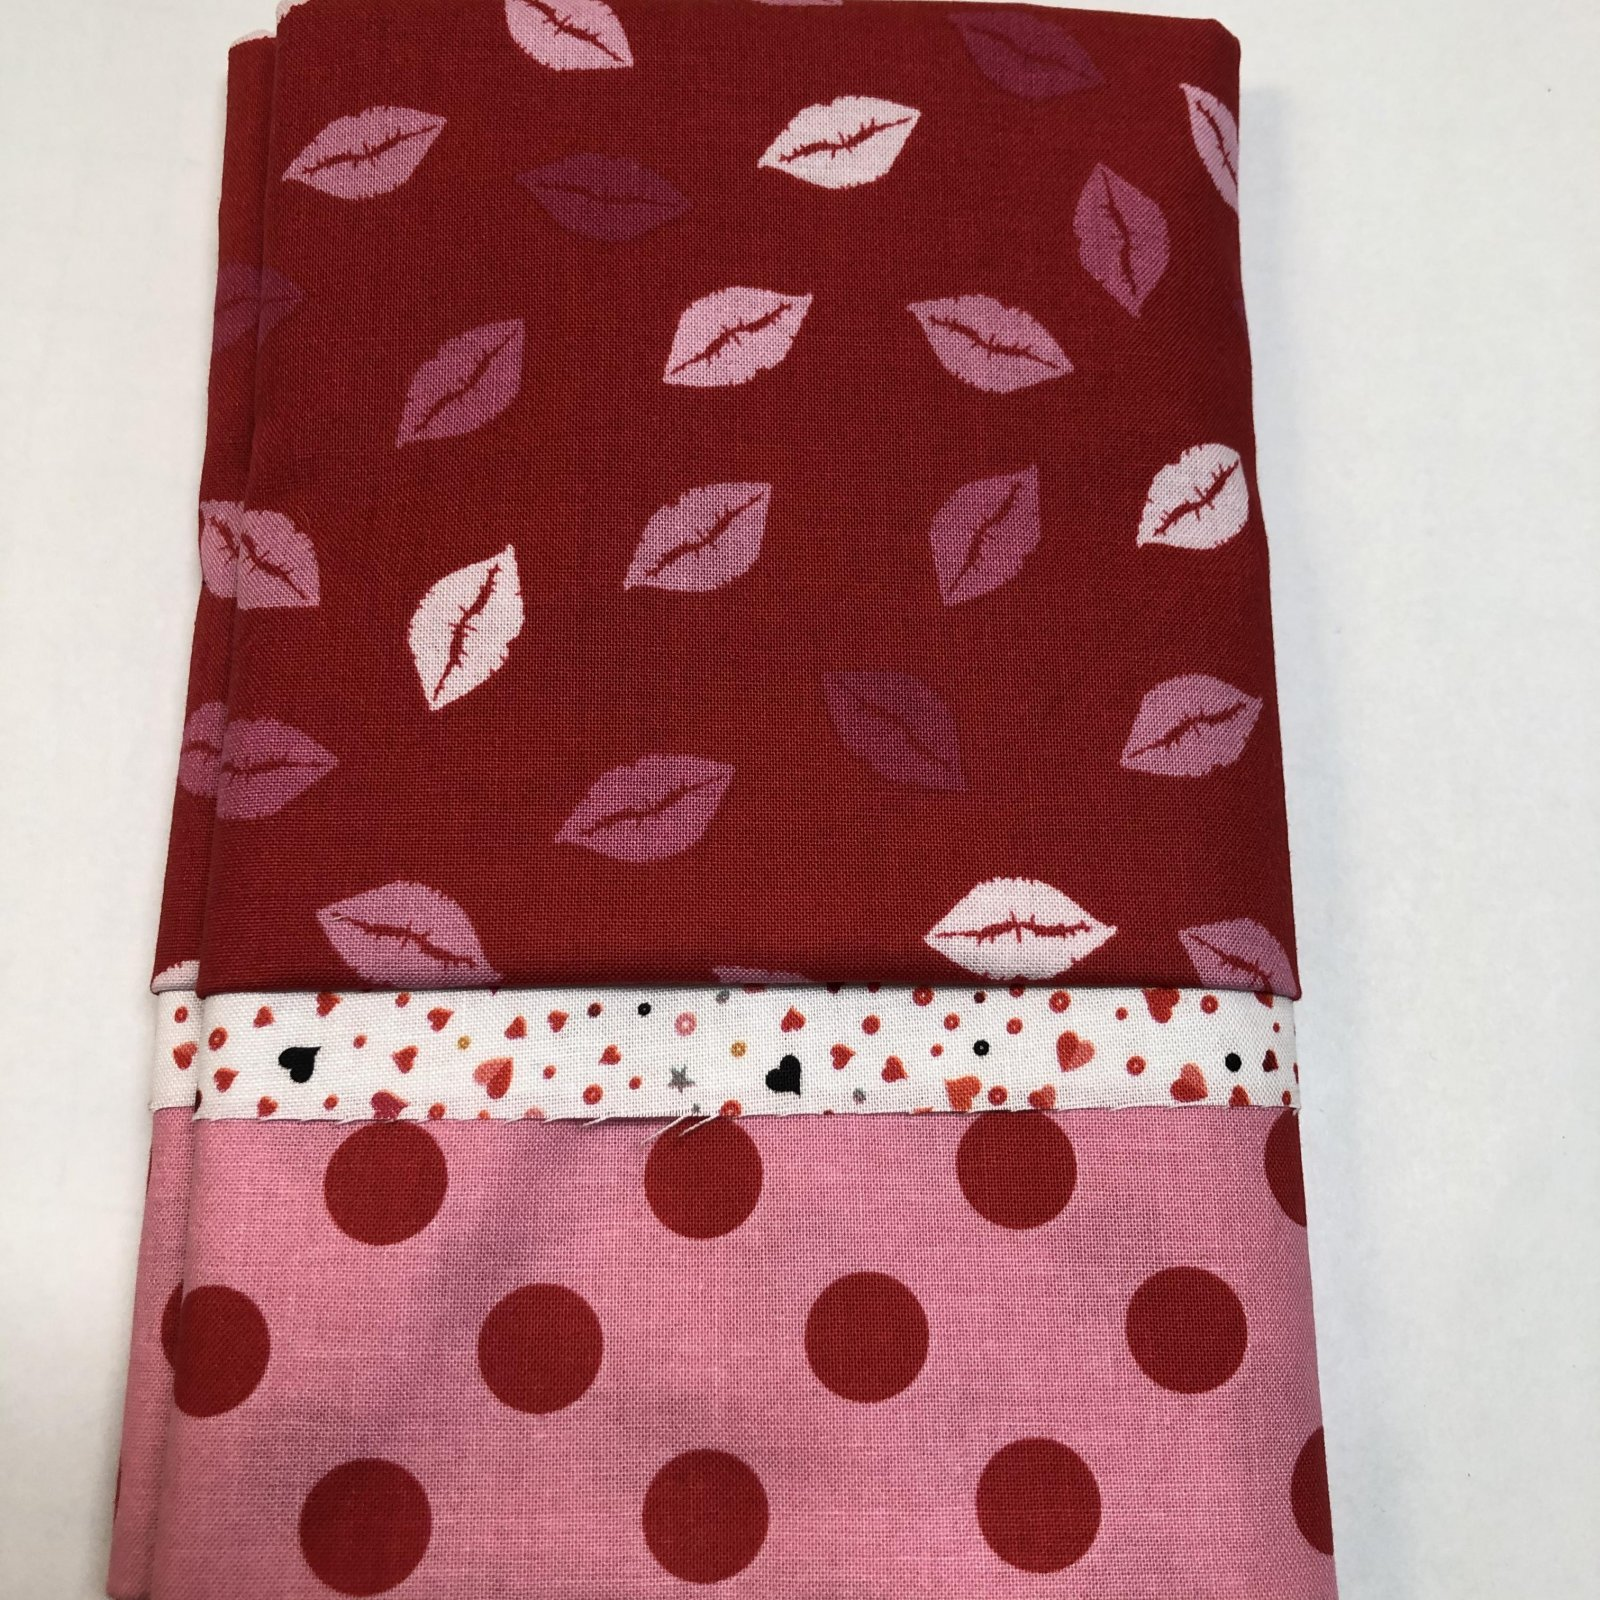 Kiss Kiss Valentine Pillowcase Kit